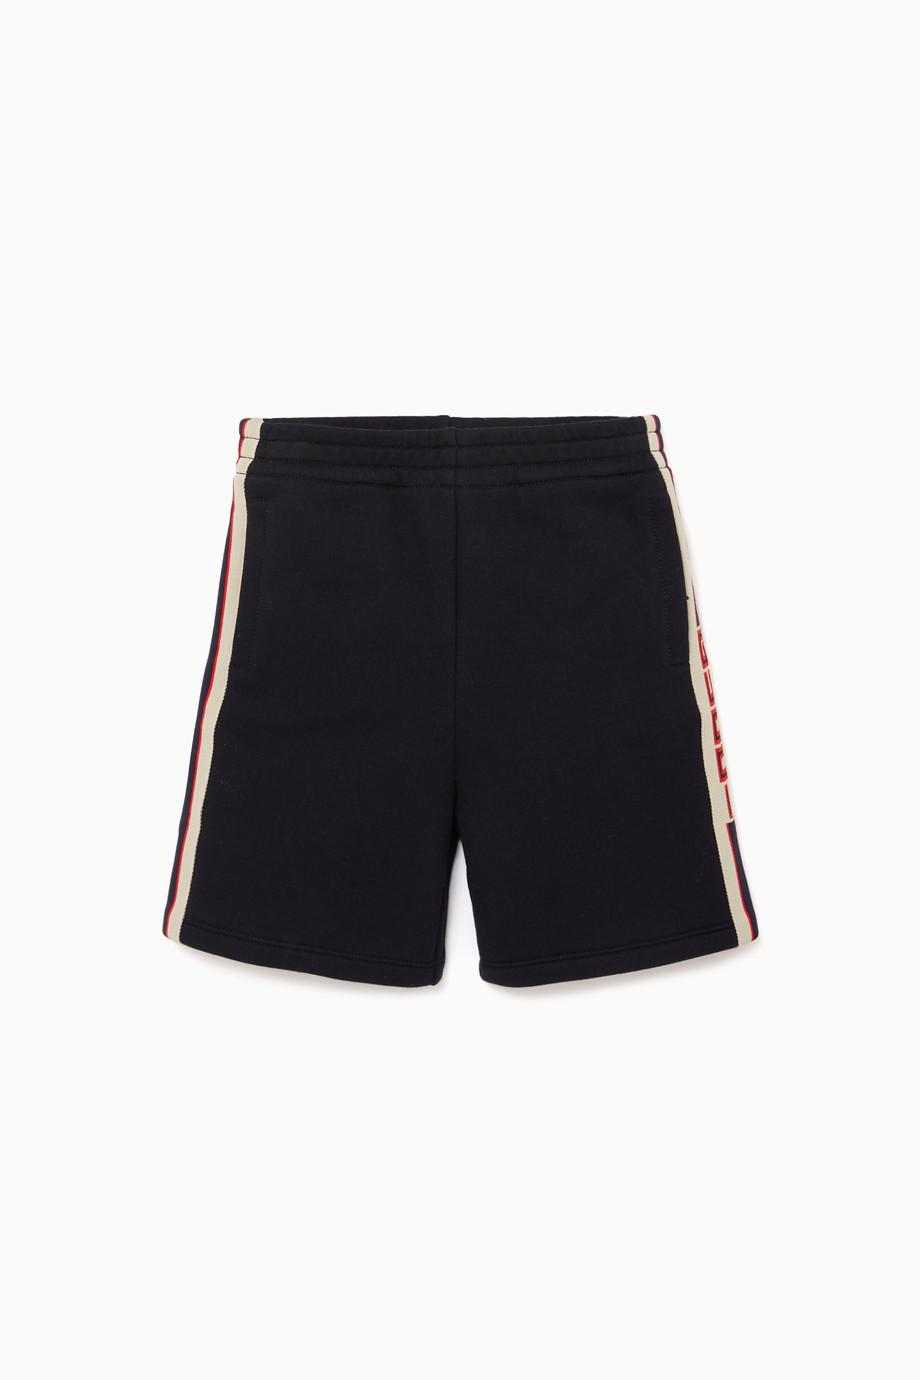 6315e04ee8b Shop Gucci Blue Logo Striped Jersey Shorts for Kids